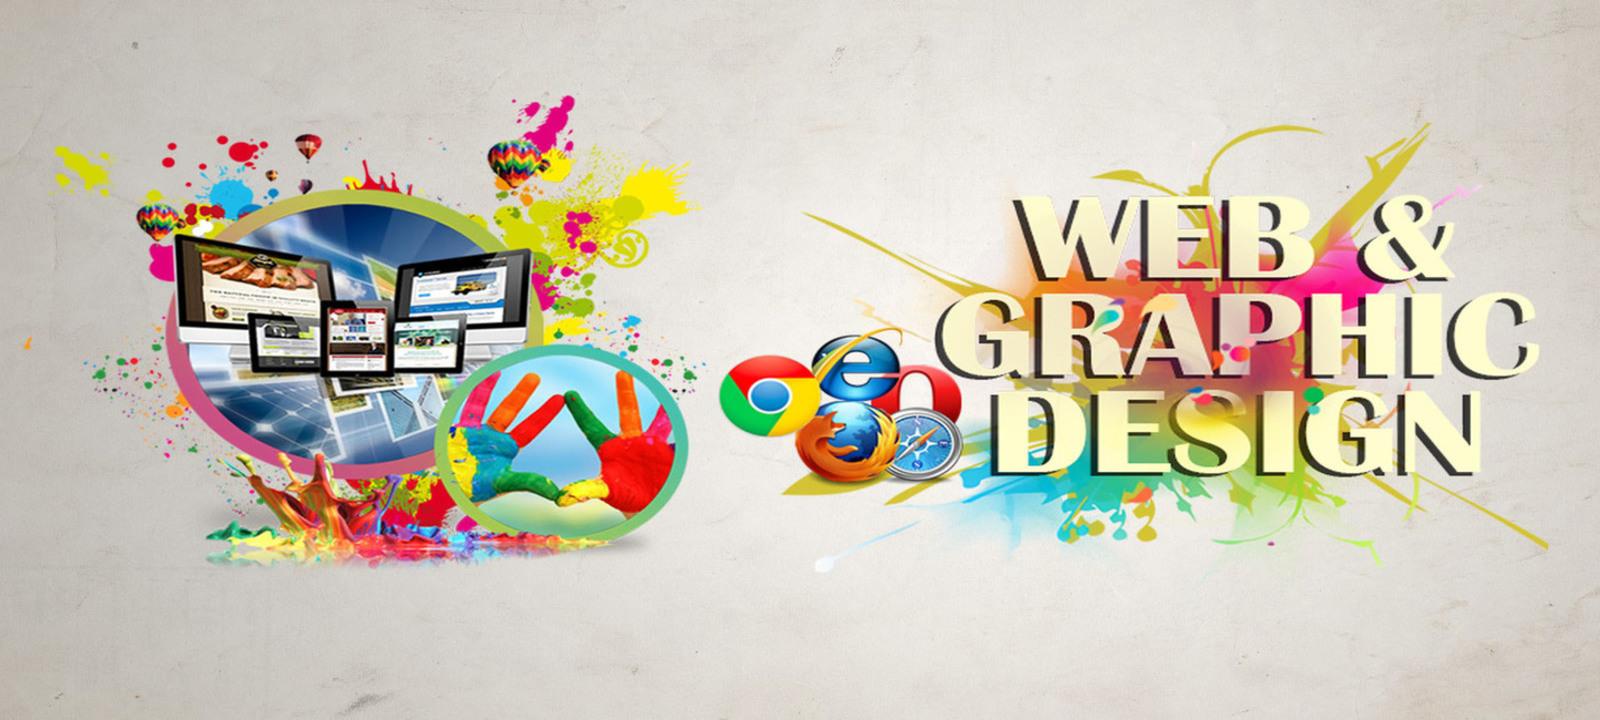 Shree Sai Infotech - Website Design Company in Pune, India